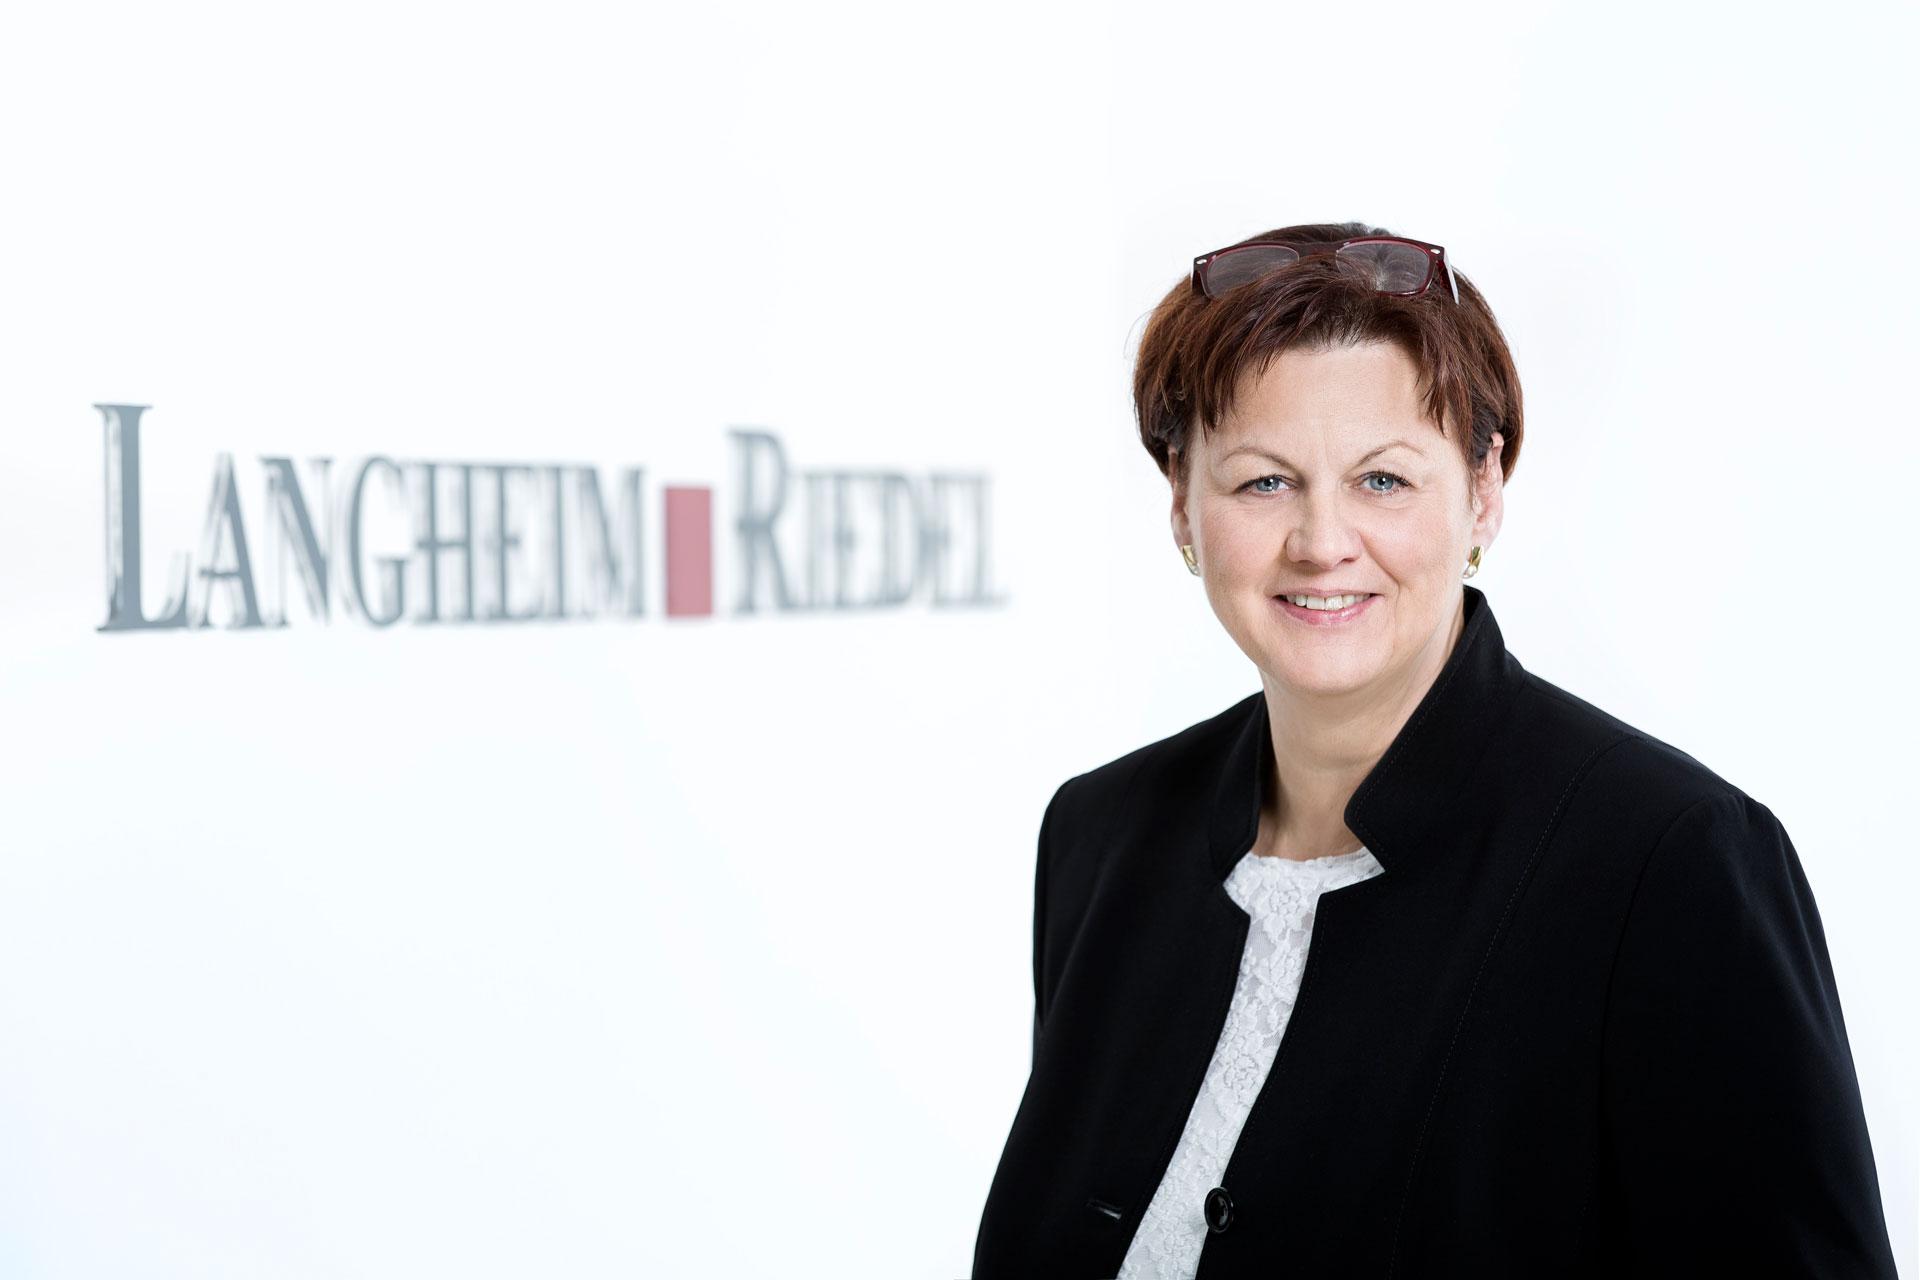 Marion Voigt